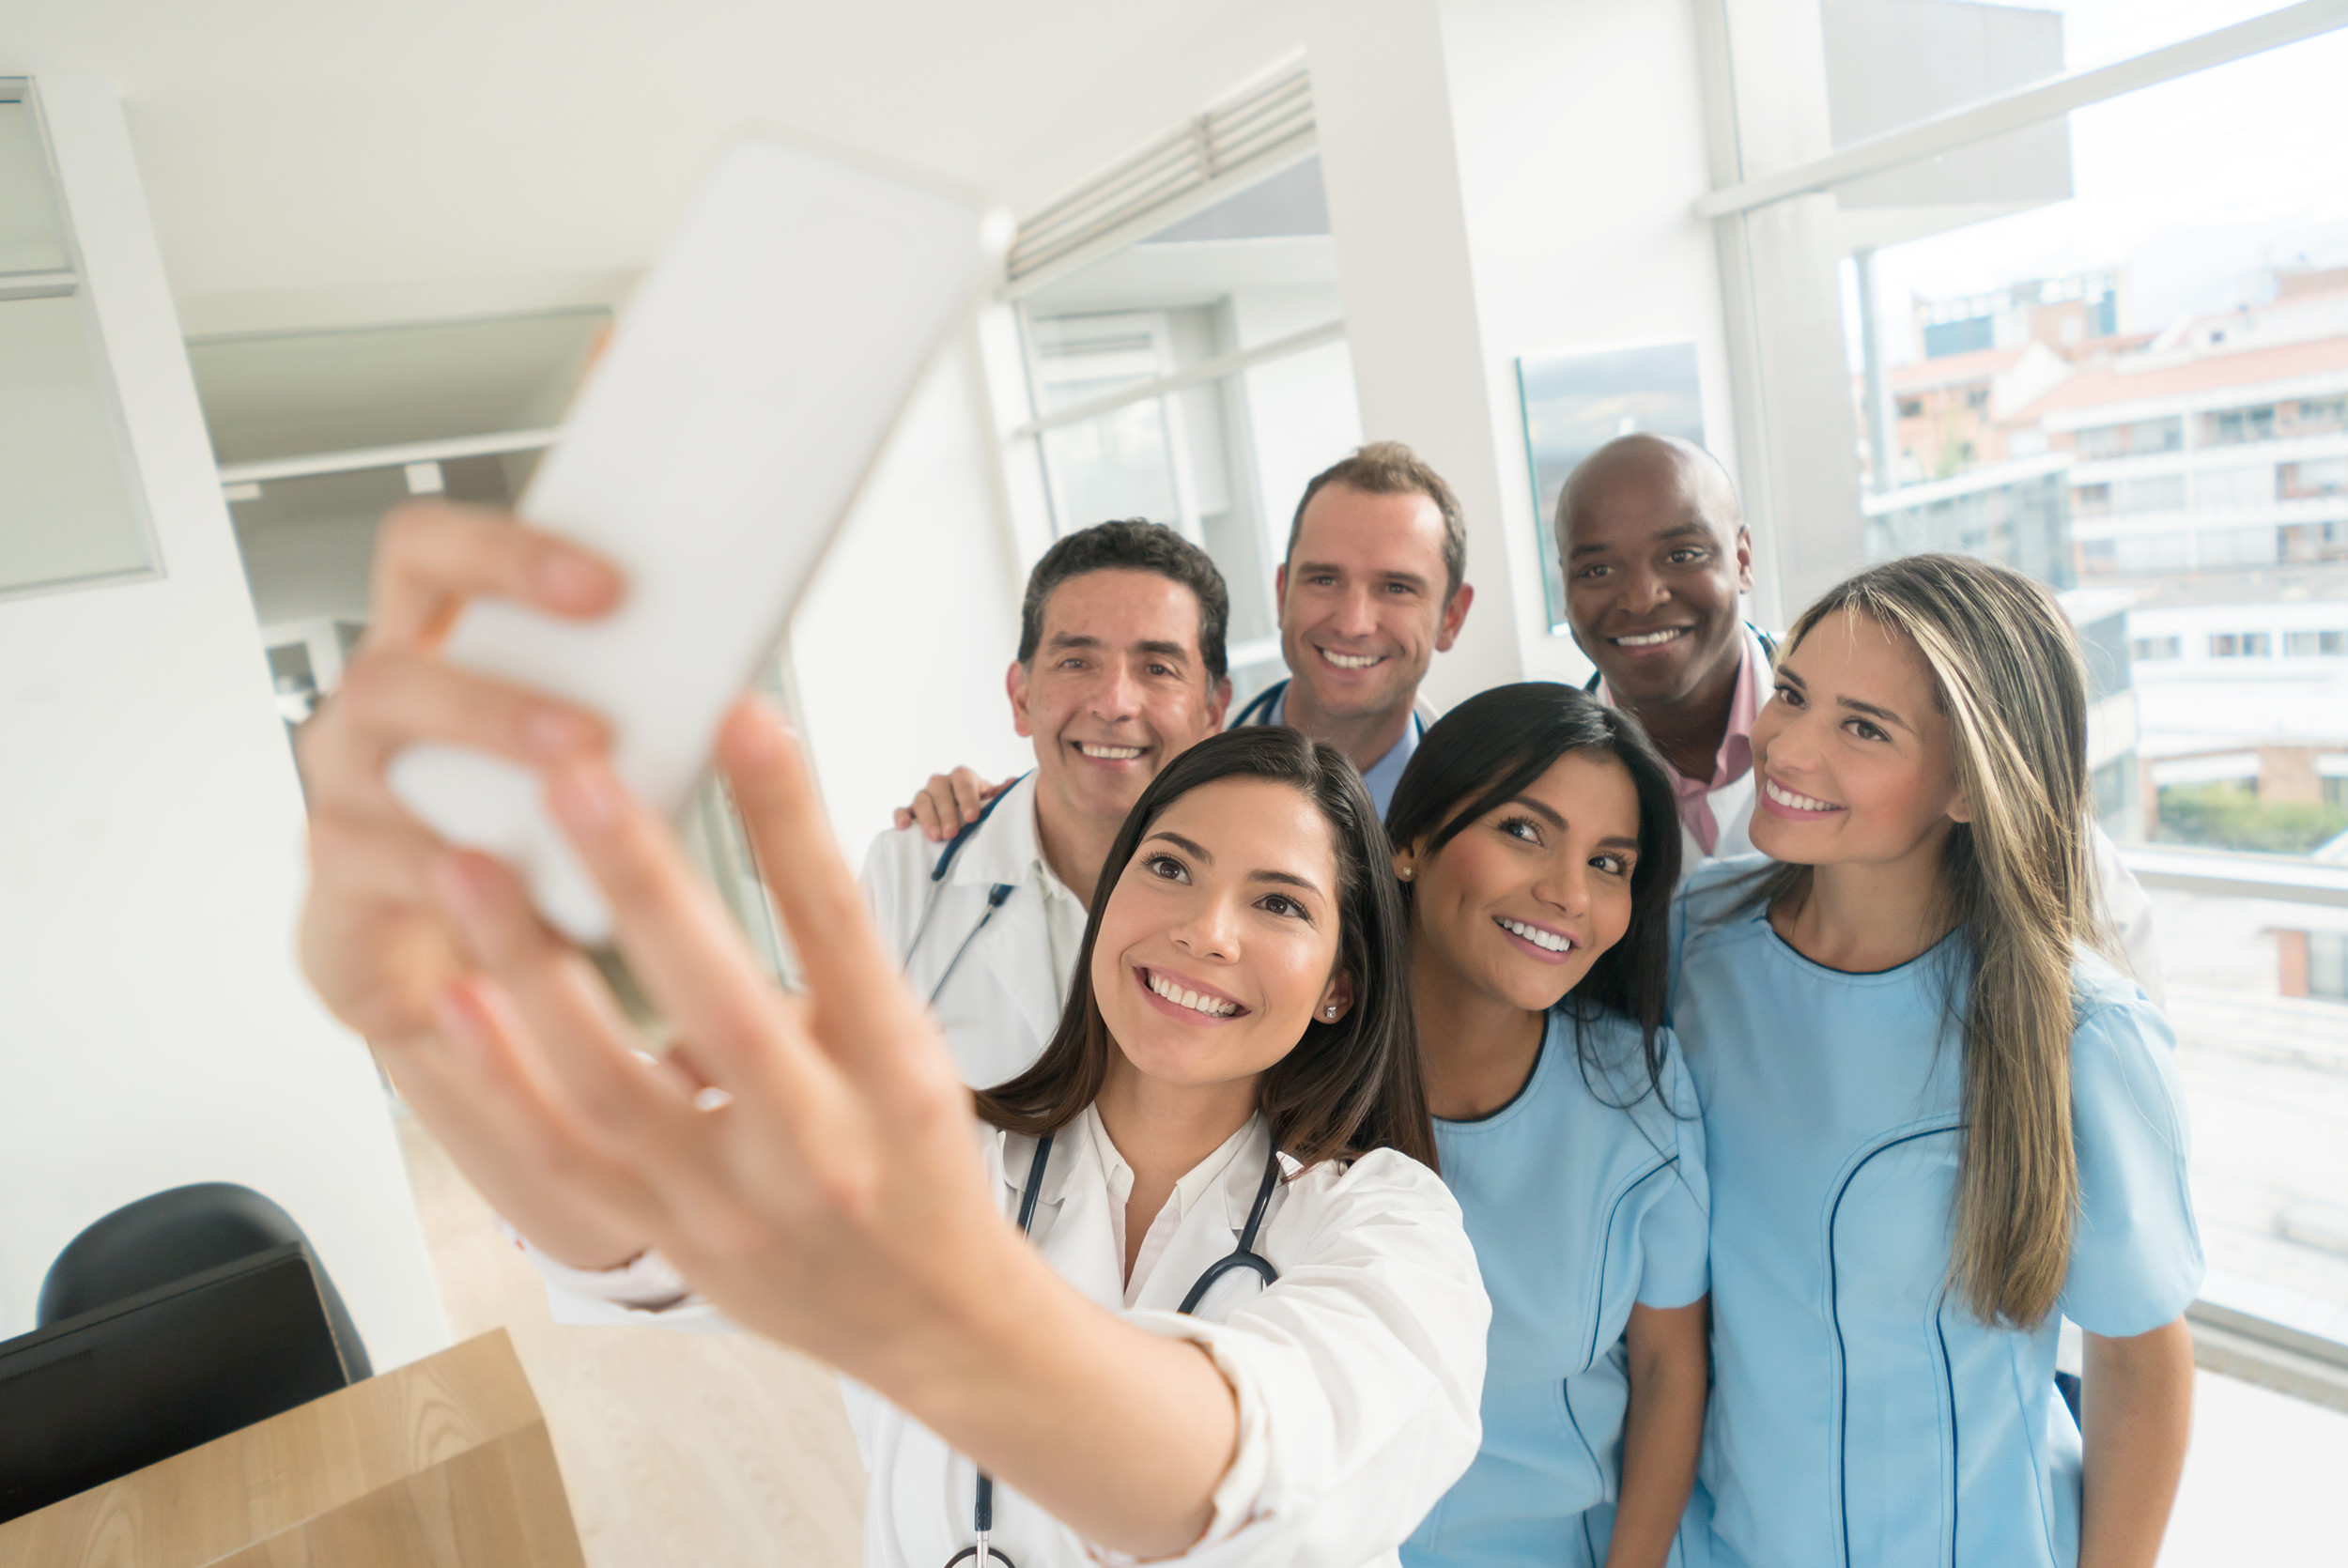 social-media-posts-medical-staff-selfie-hospital.jpg